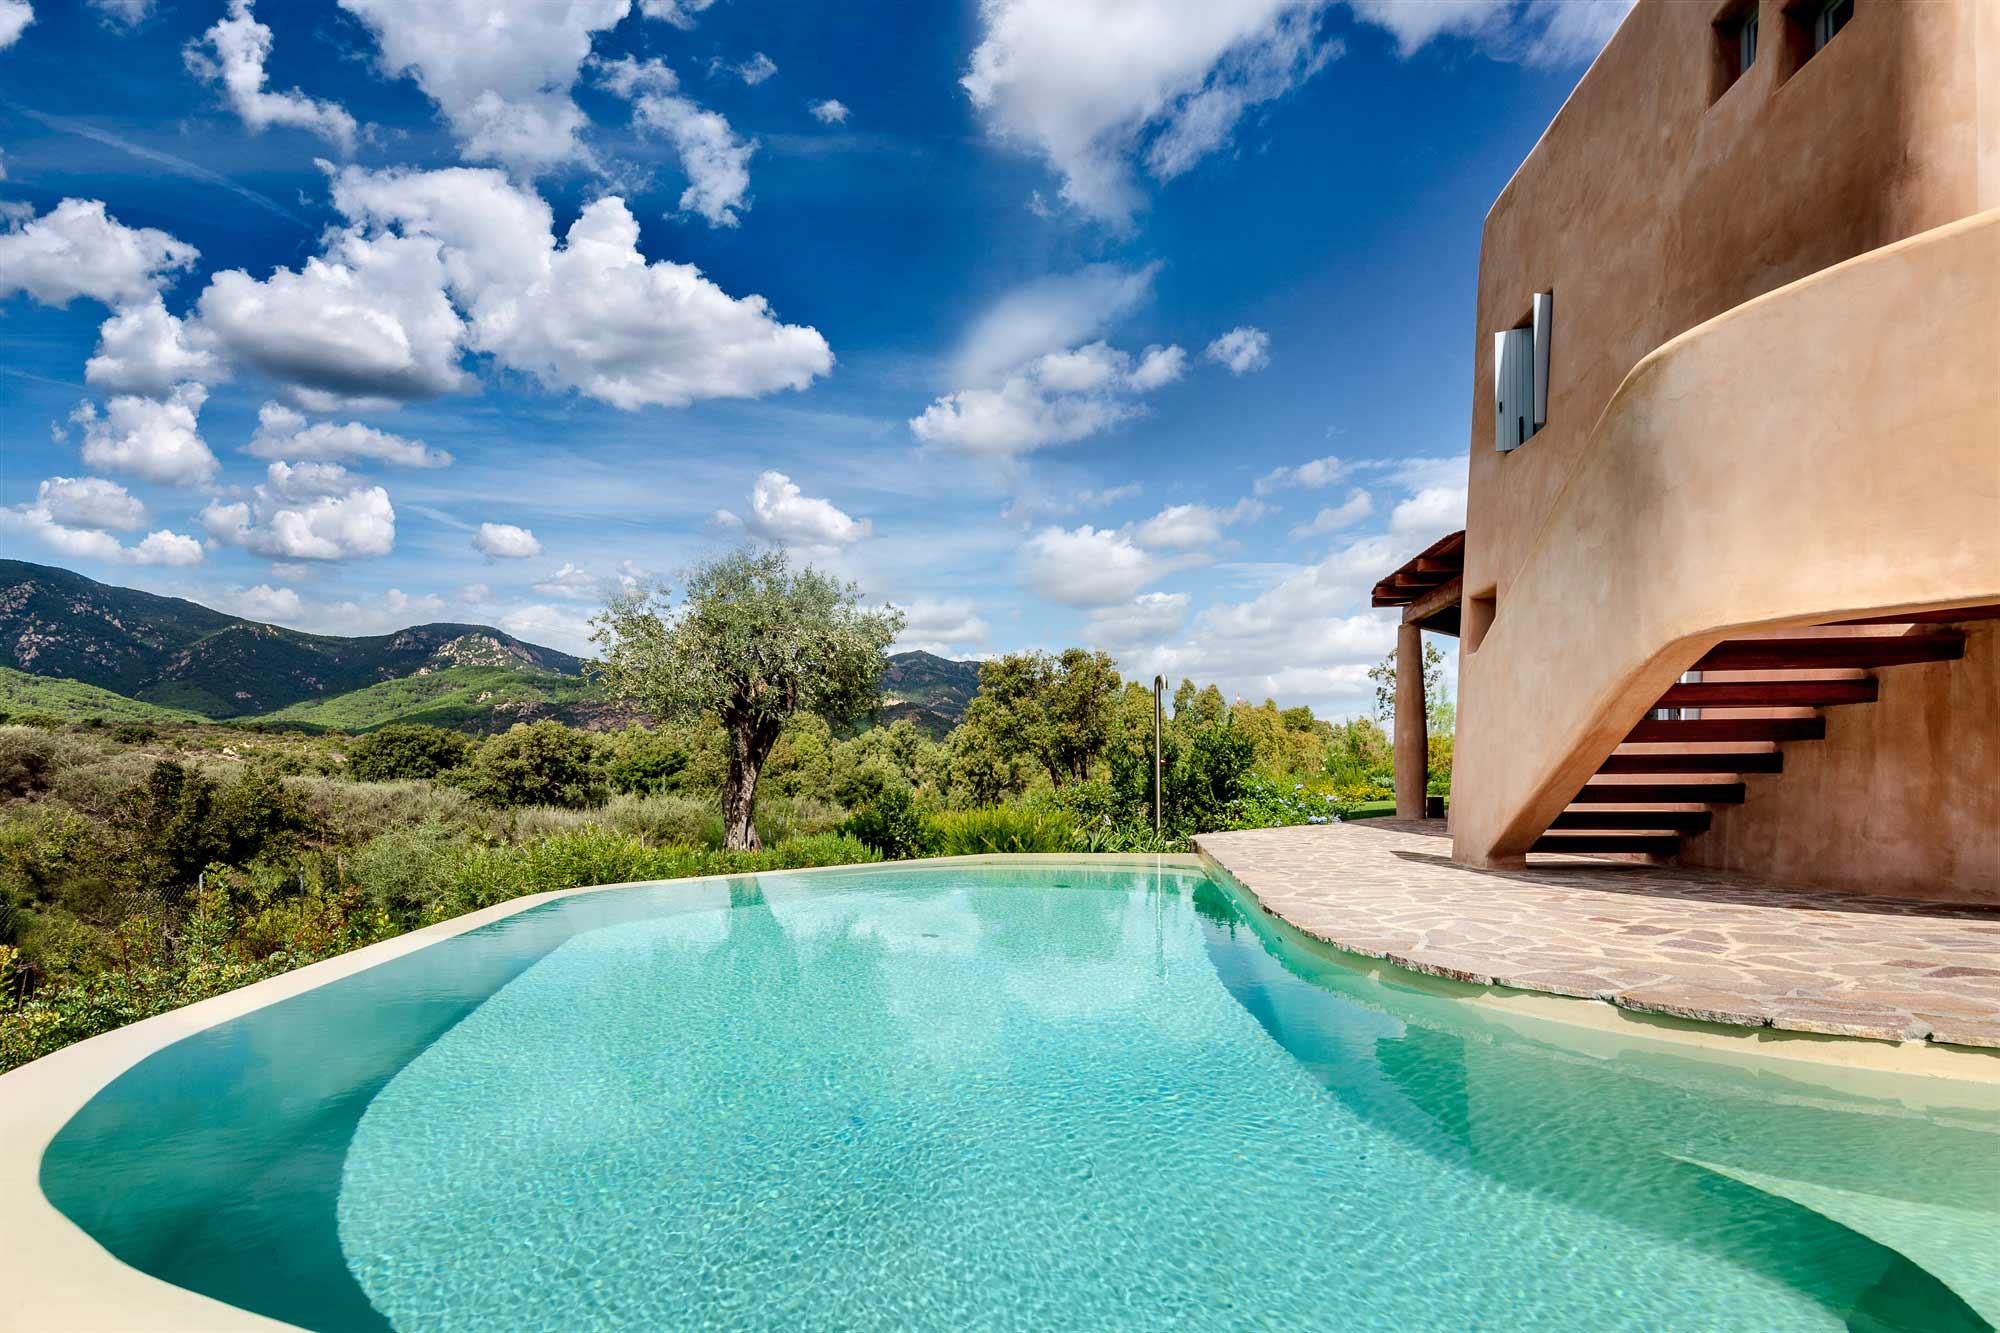 Is Molas - Villa Nea Swimming Pool